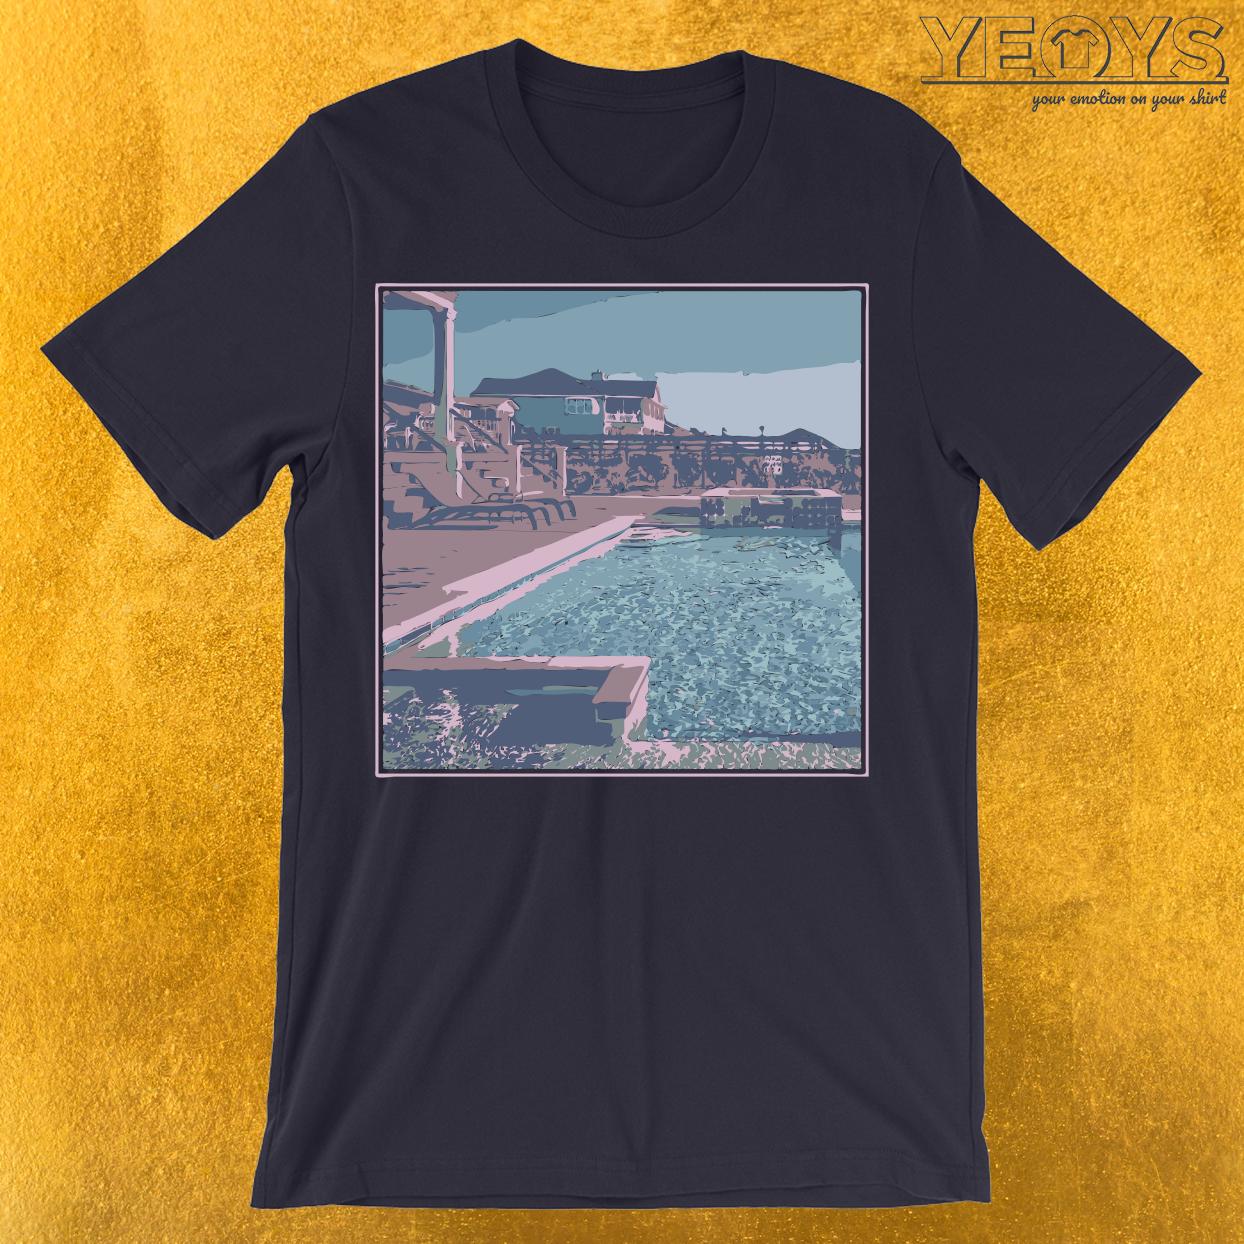 Vaporwave Aesthetics T-Shirt